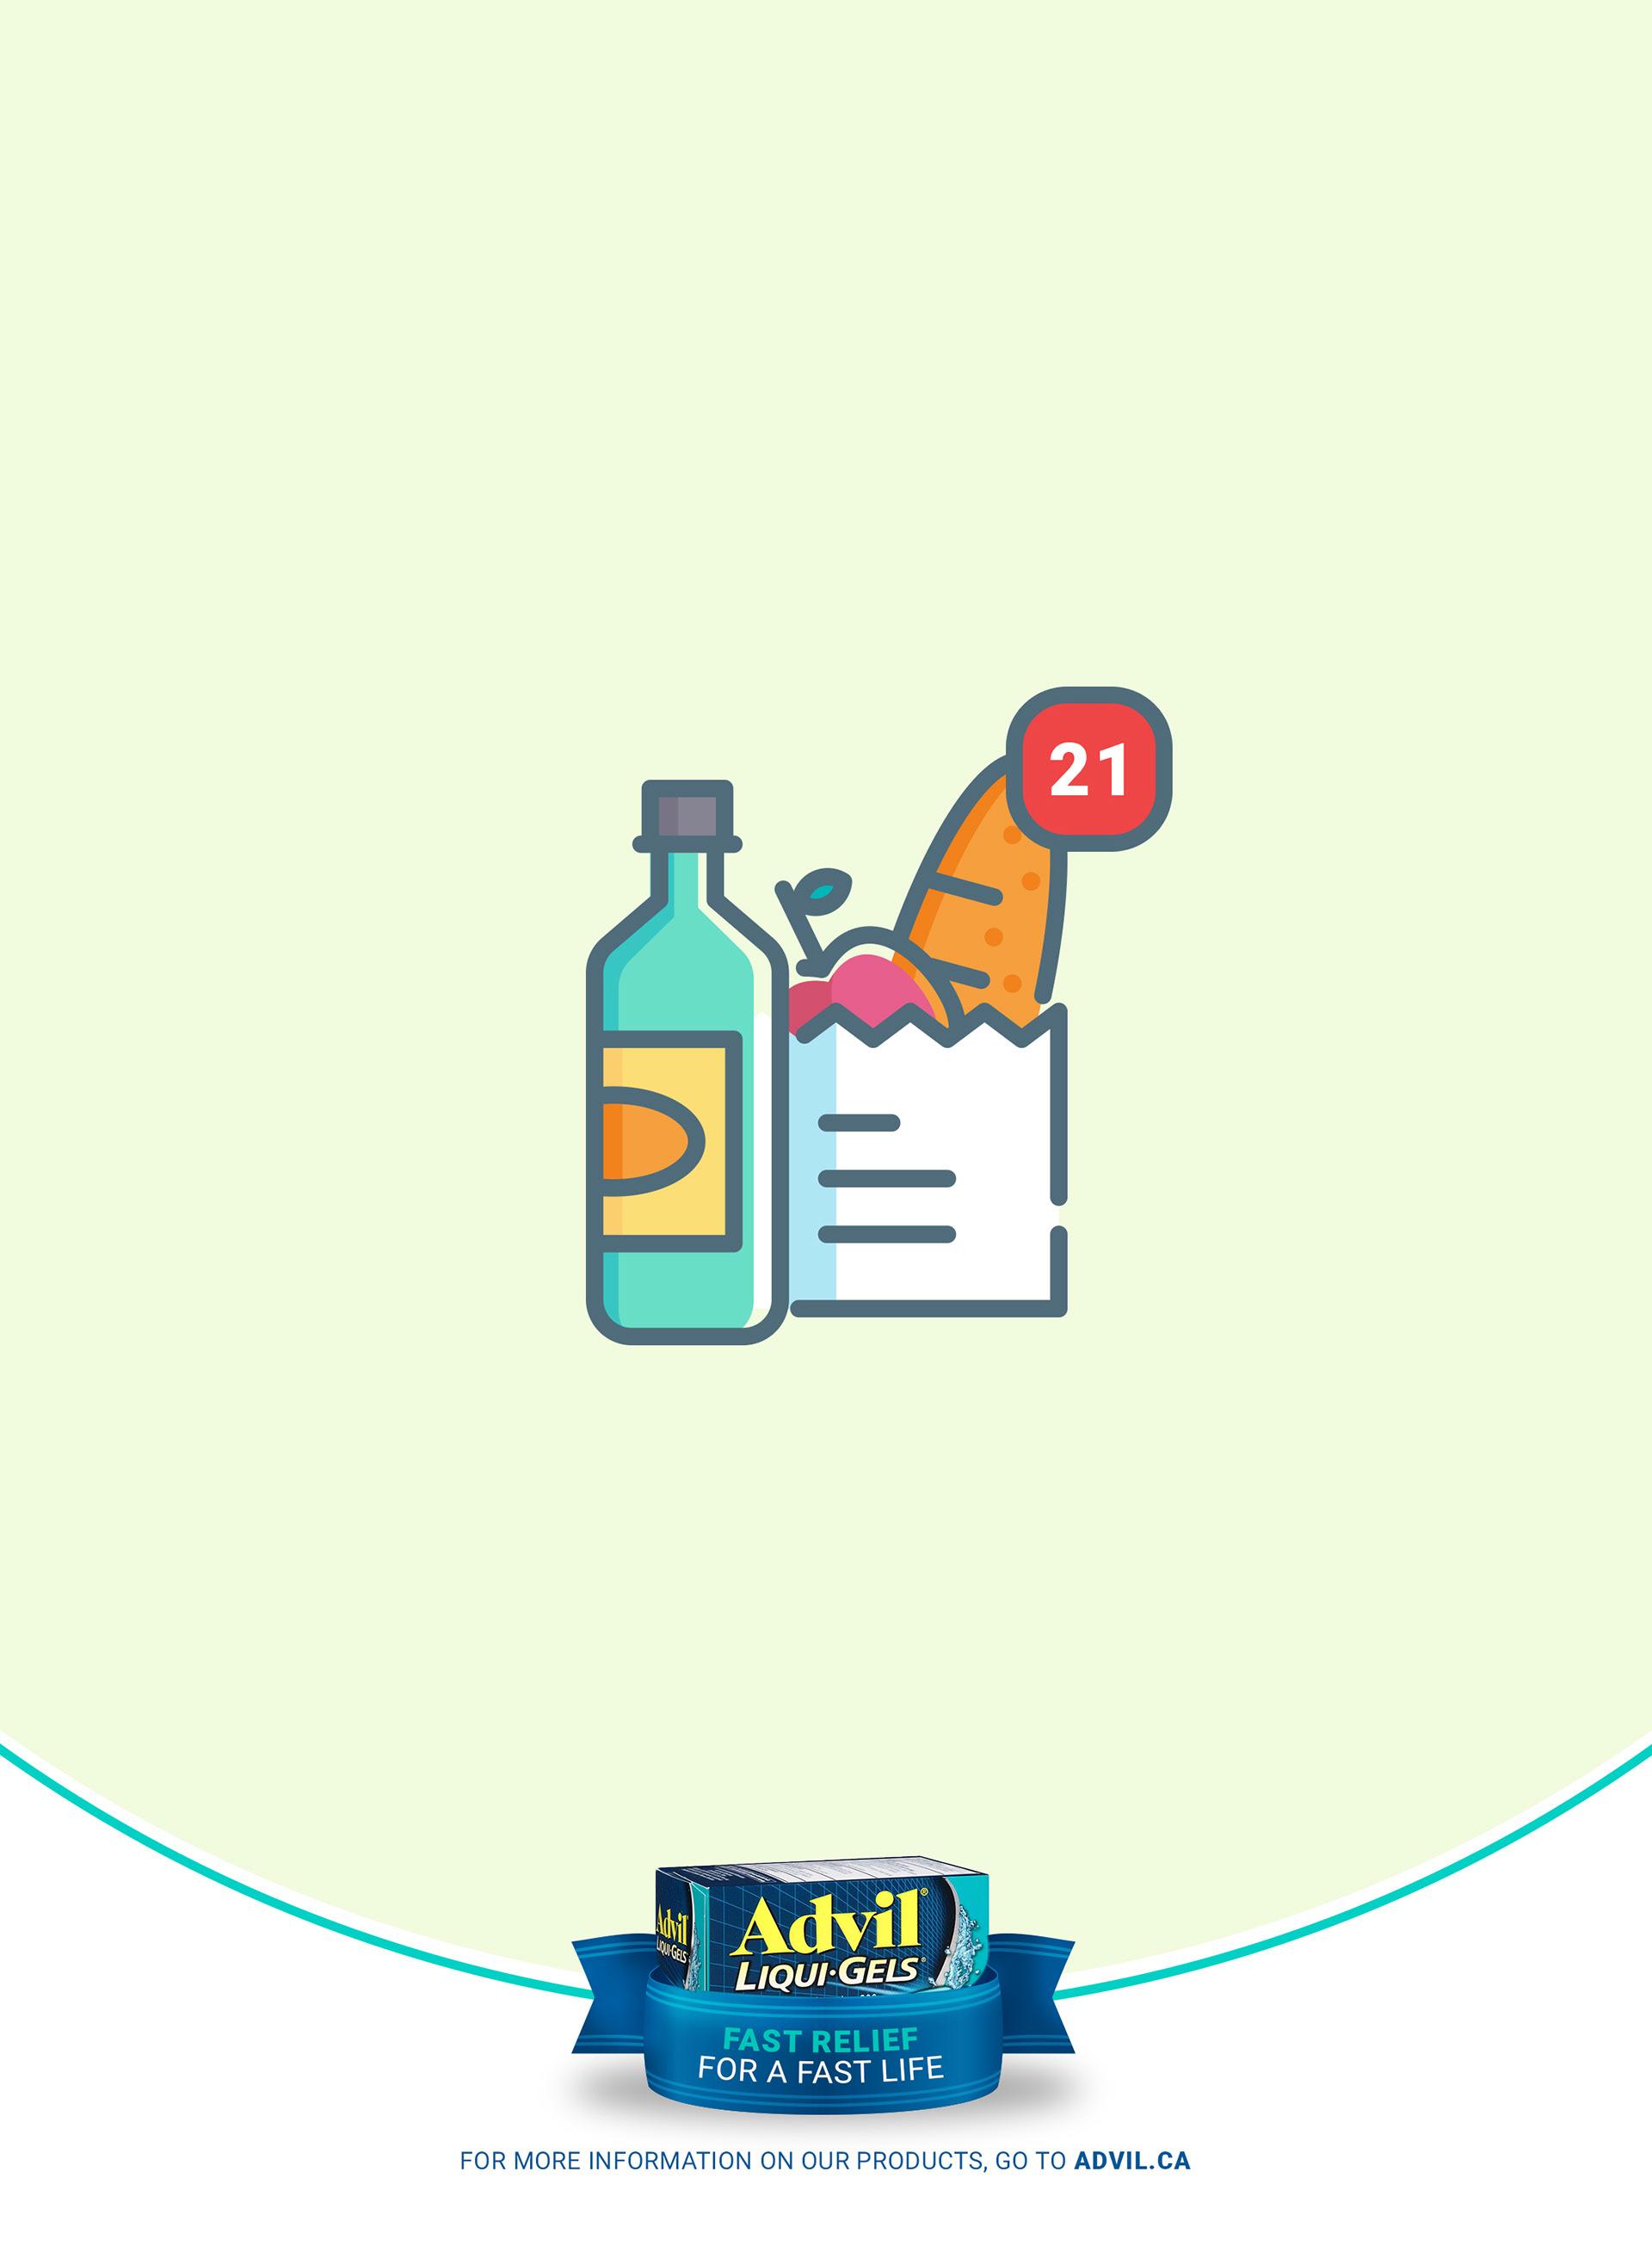 Advil.